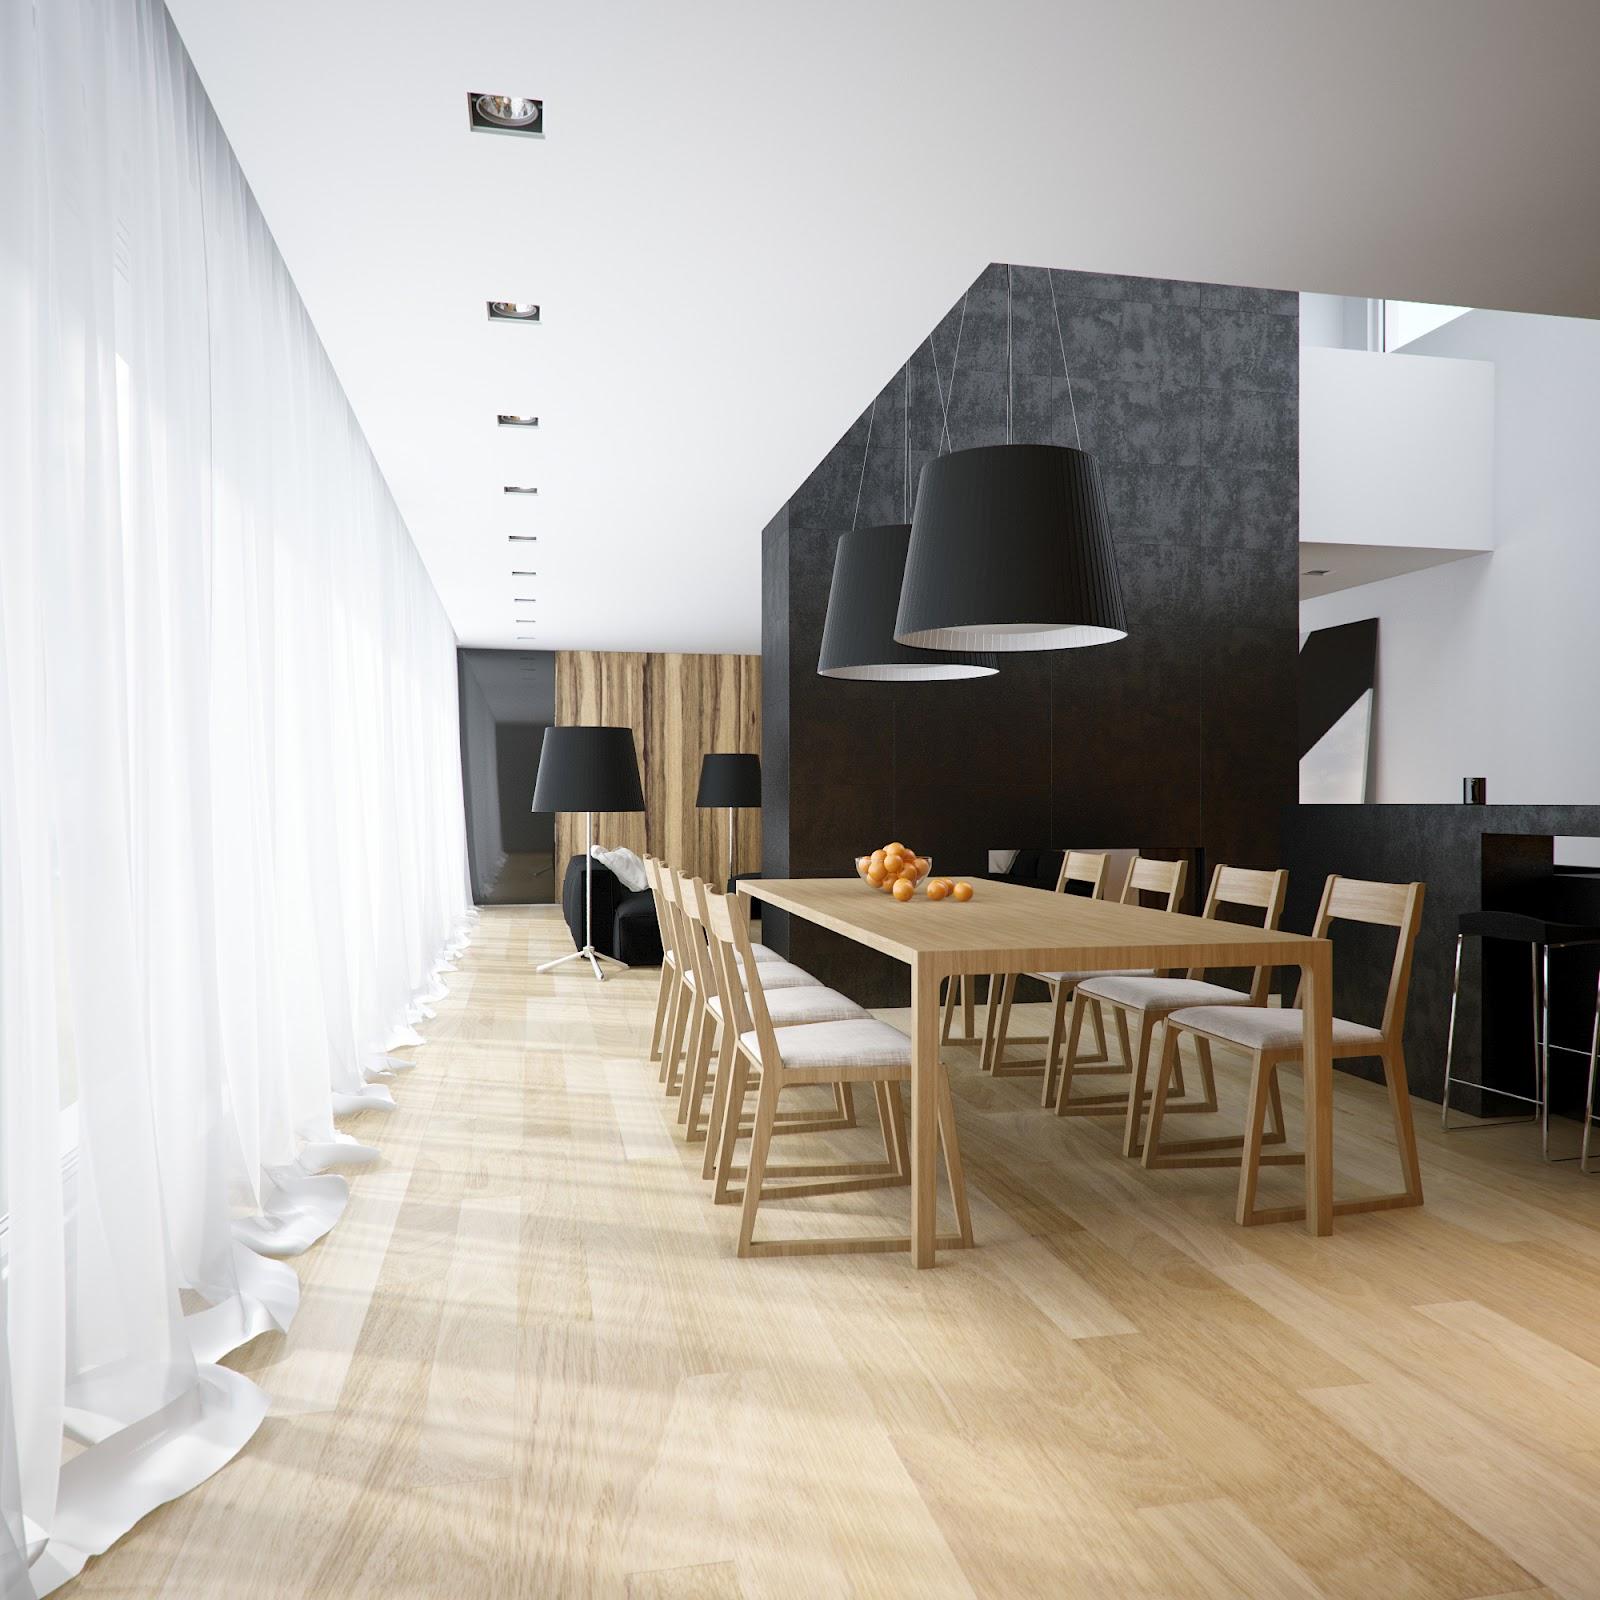 2-Black-white-pine-dining-room-scheme-large-table.jpg